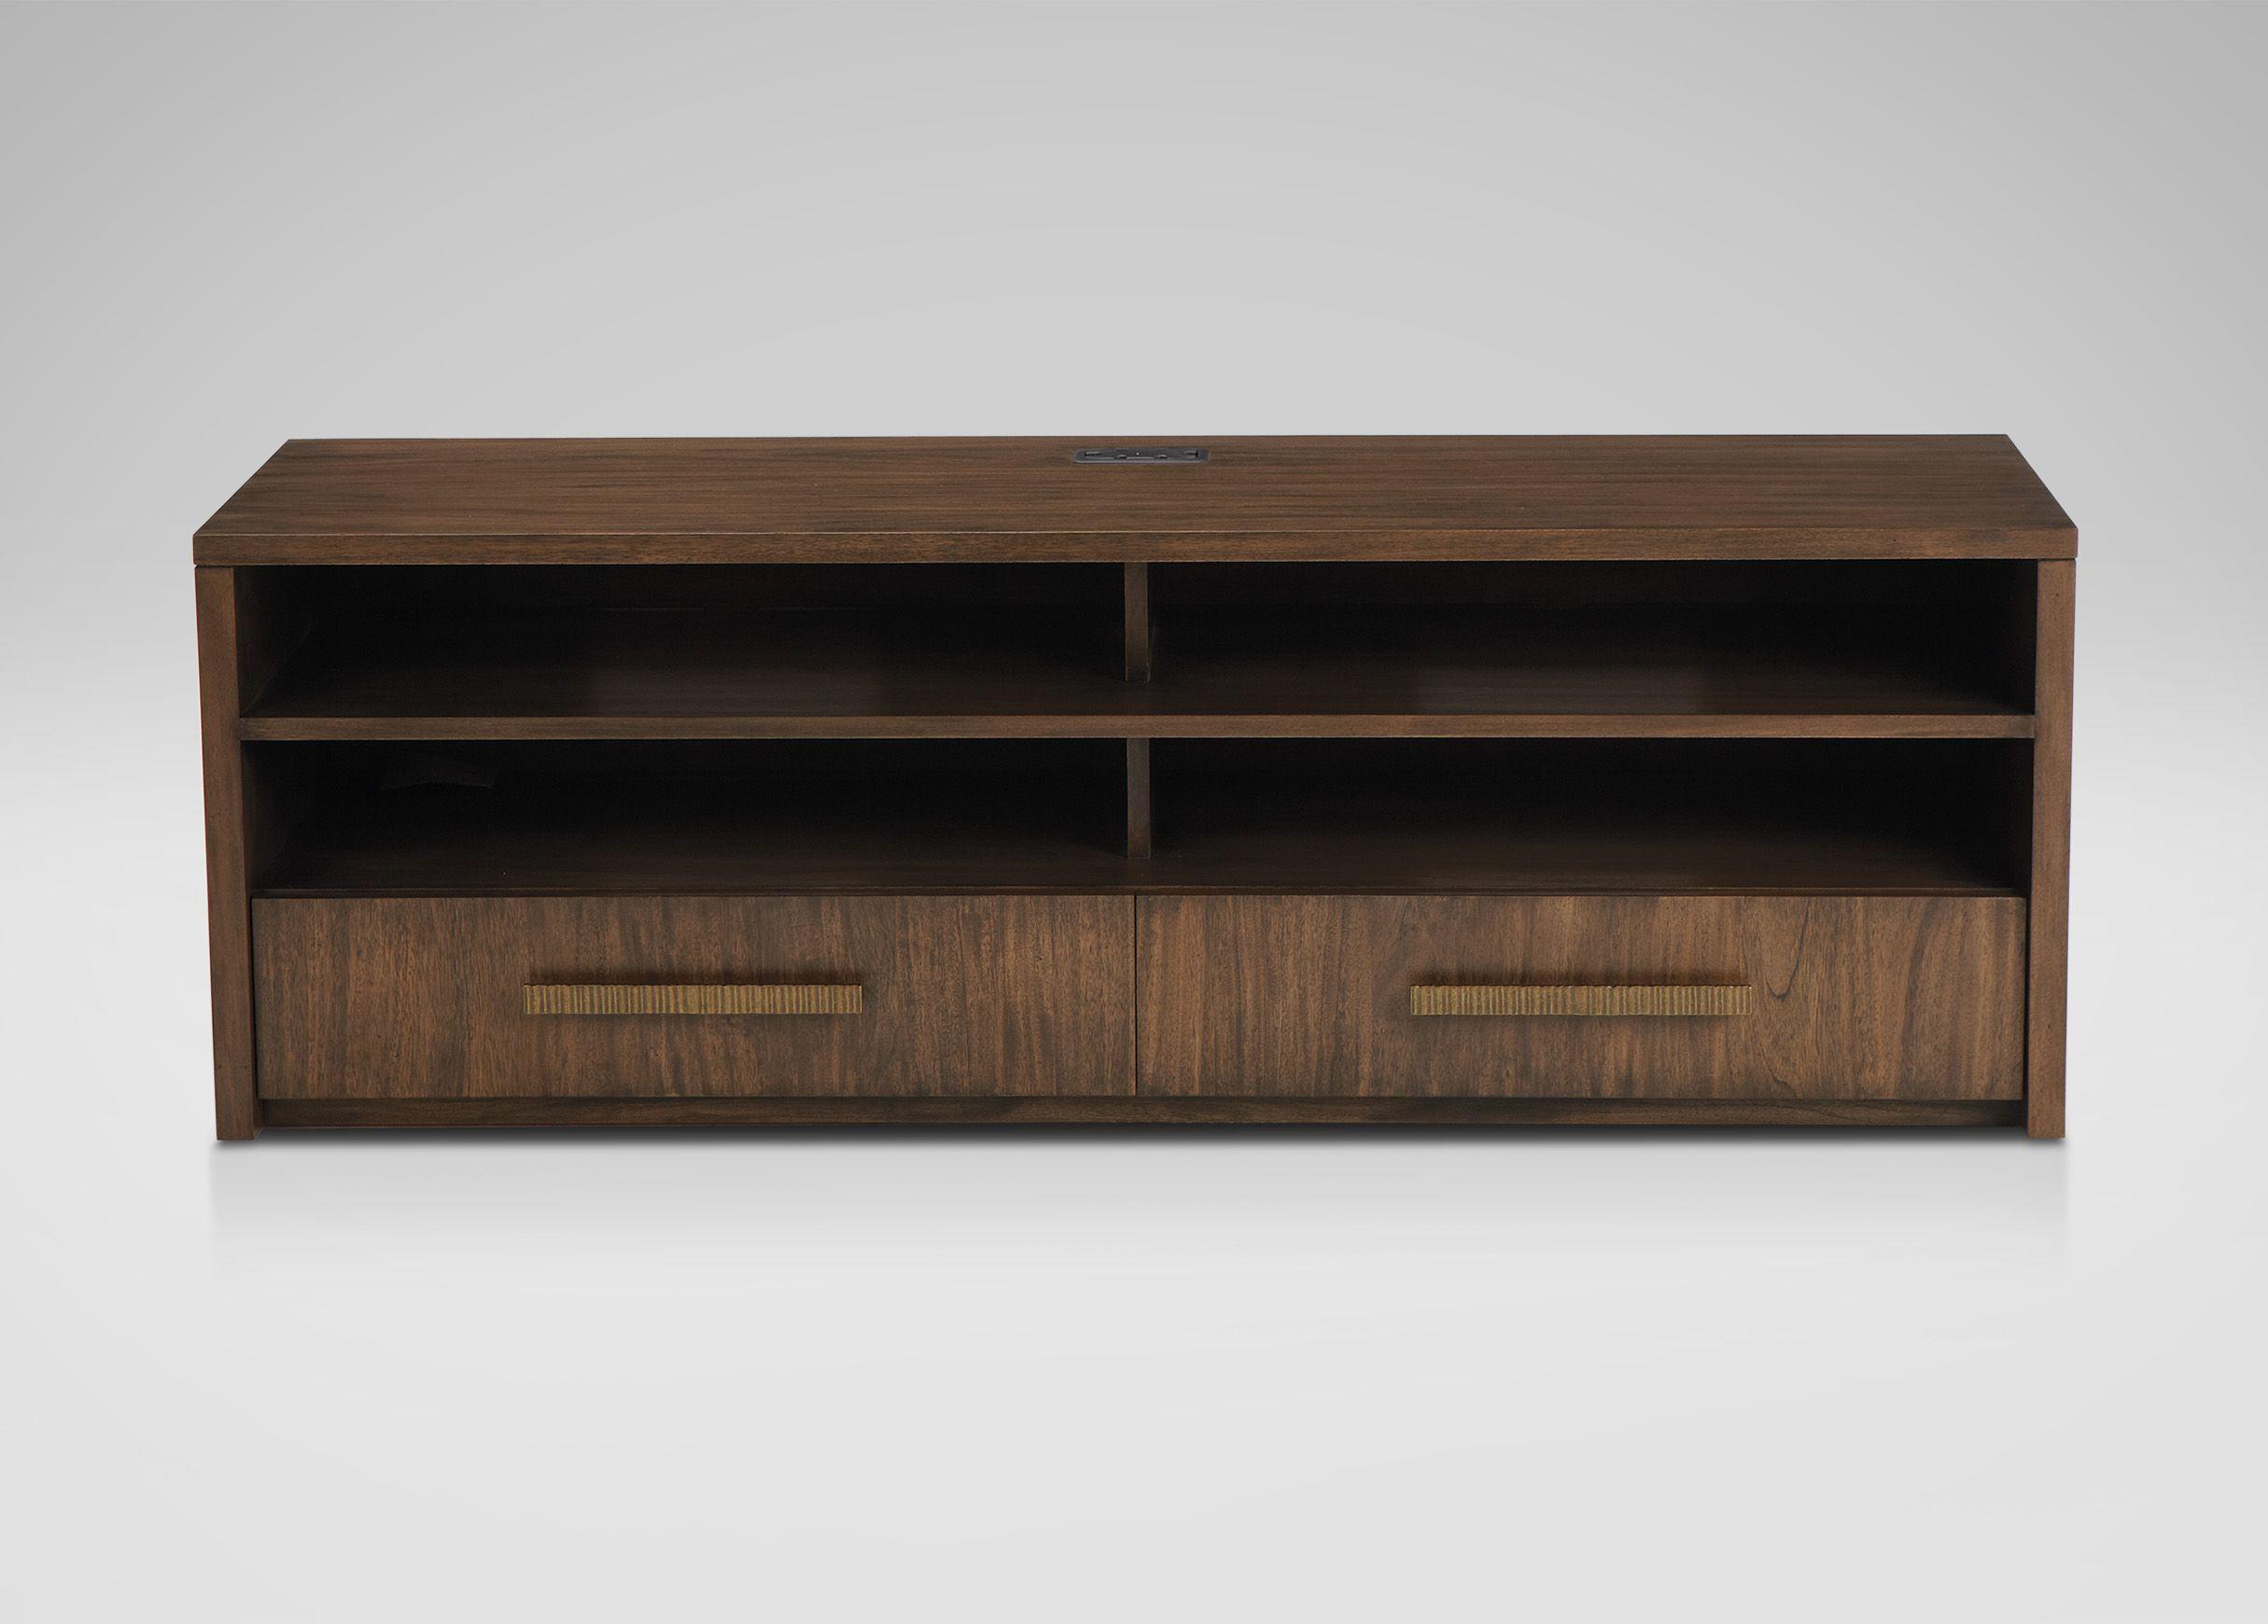 Benton Small Media Cabinet Ethan Allen